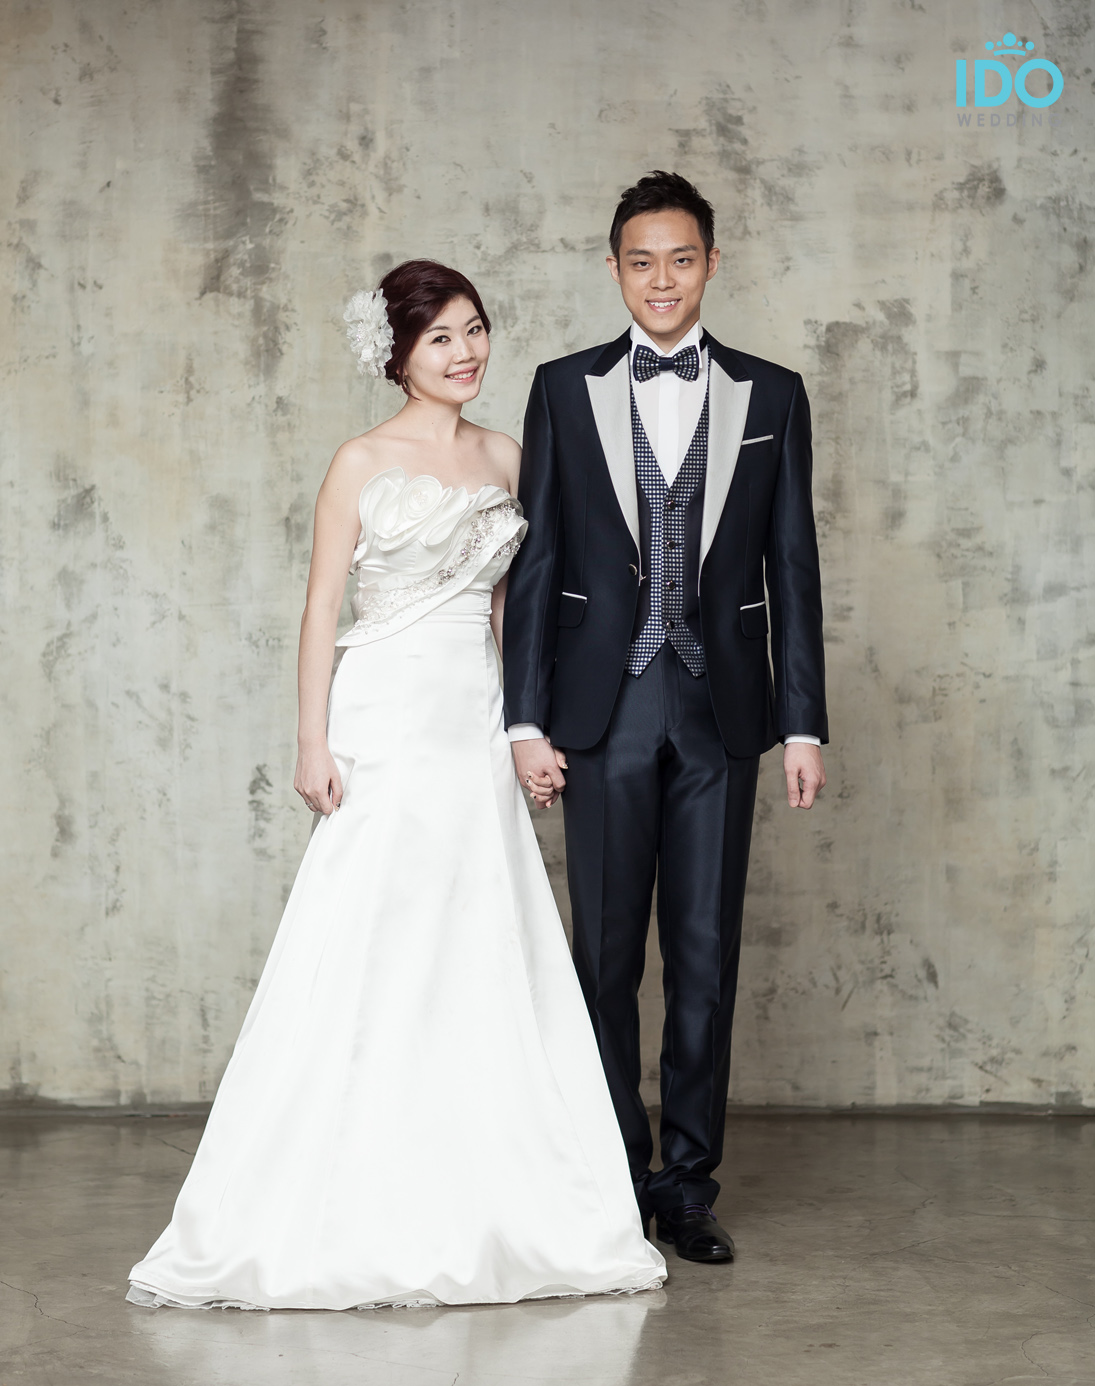 Korean Pre-wedding Photo | Korean Wedding Photo - IDO WEDDING ...